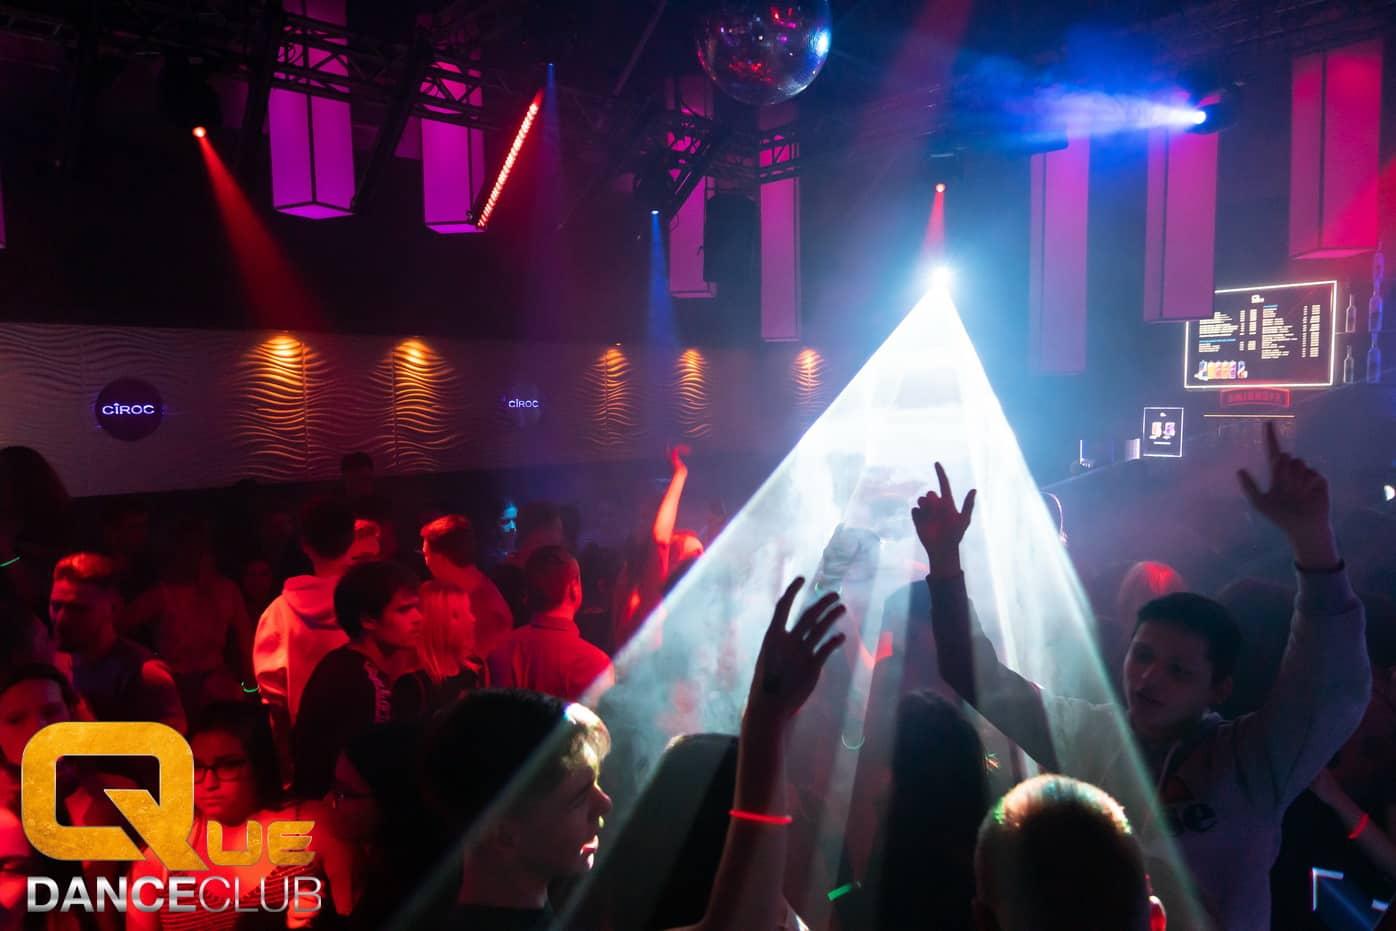 2019_02_15_Que_Danceclub_Secret_Kiss_Nightlife_Scene_Timo_038